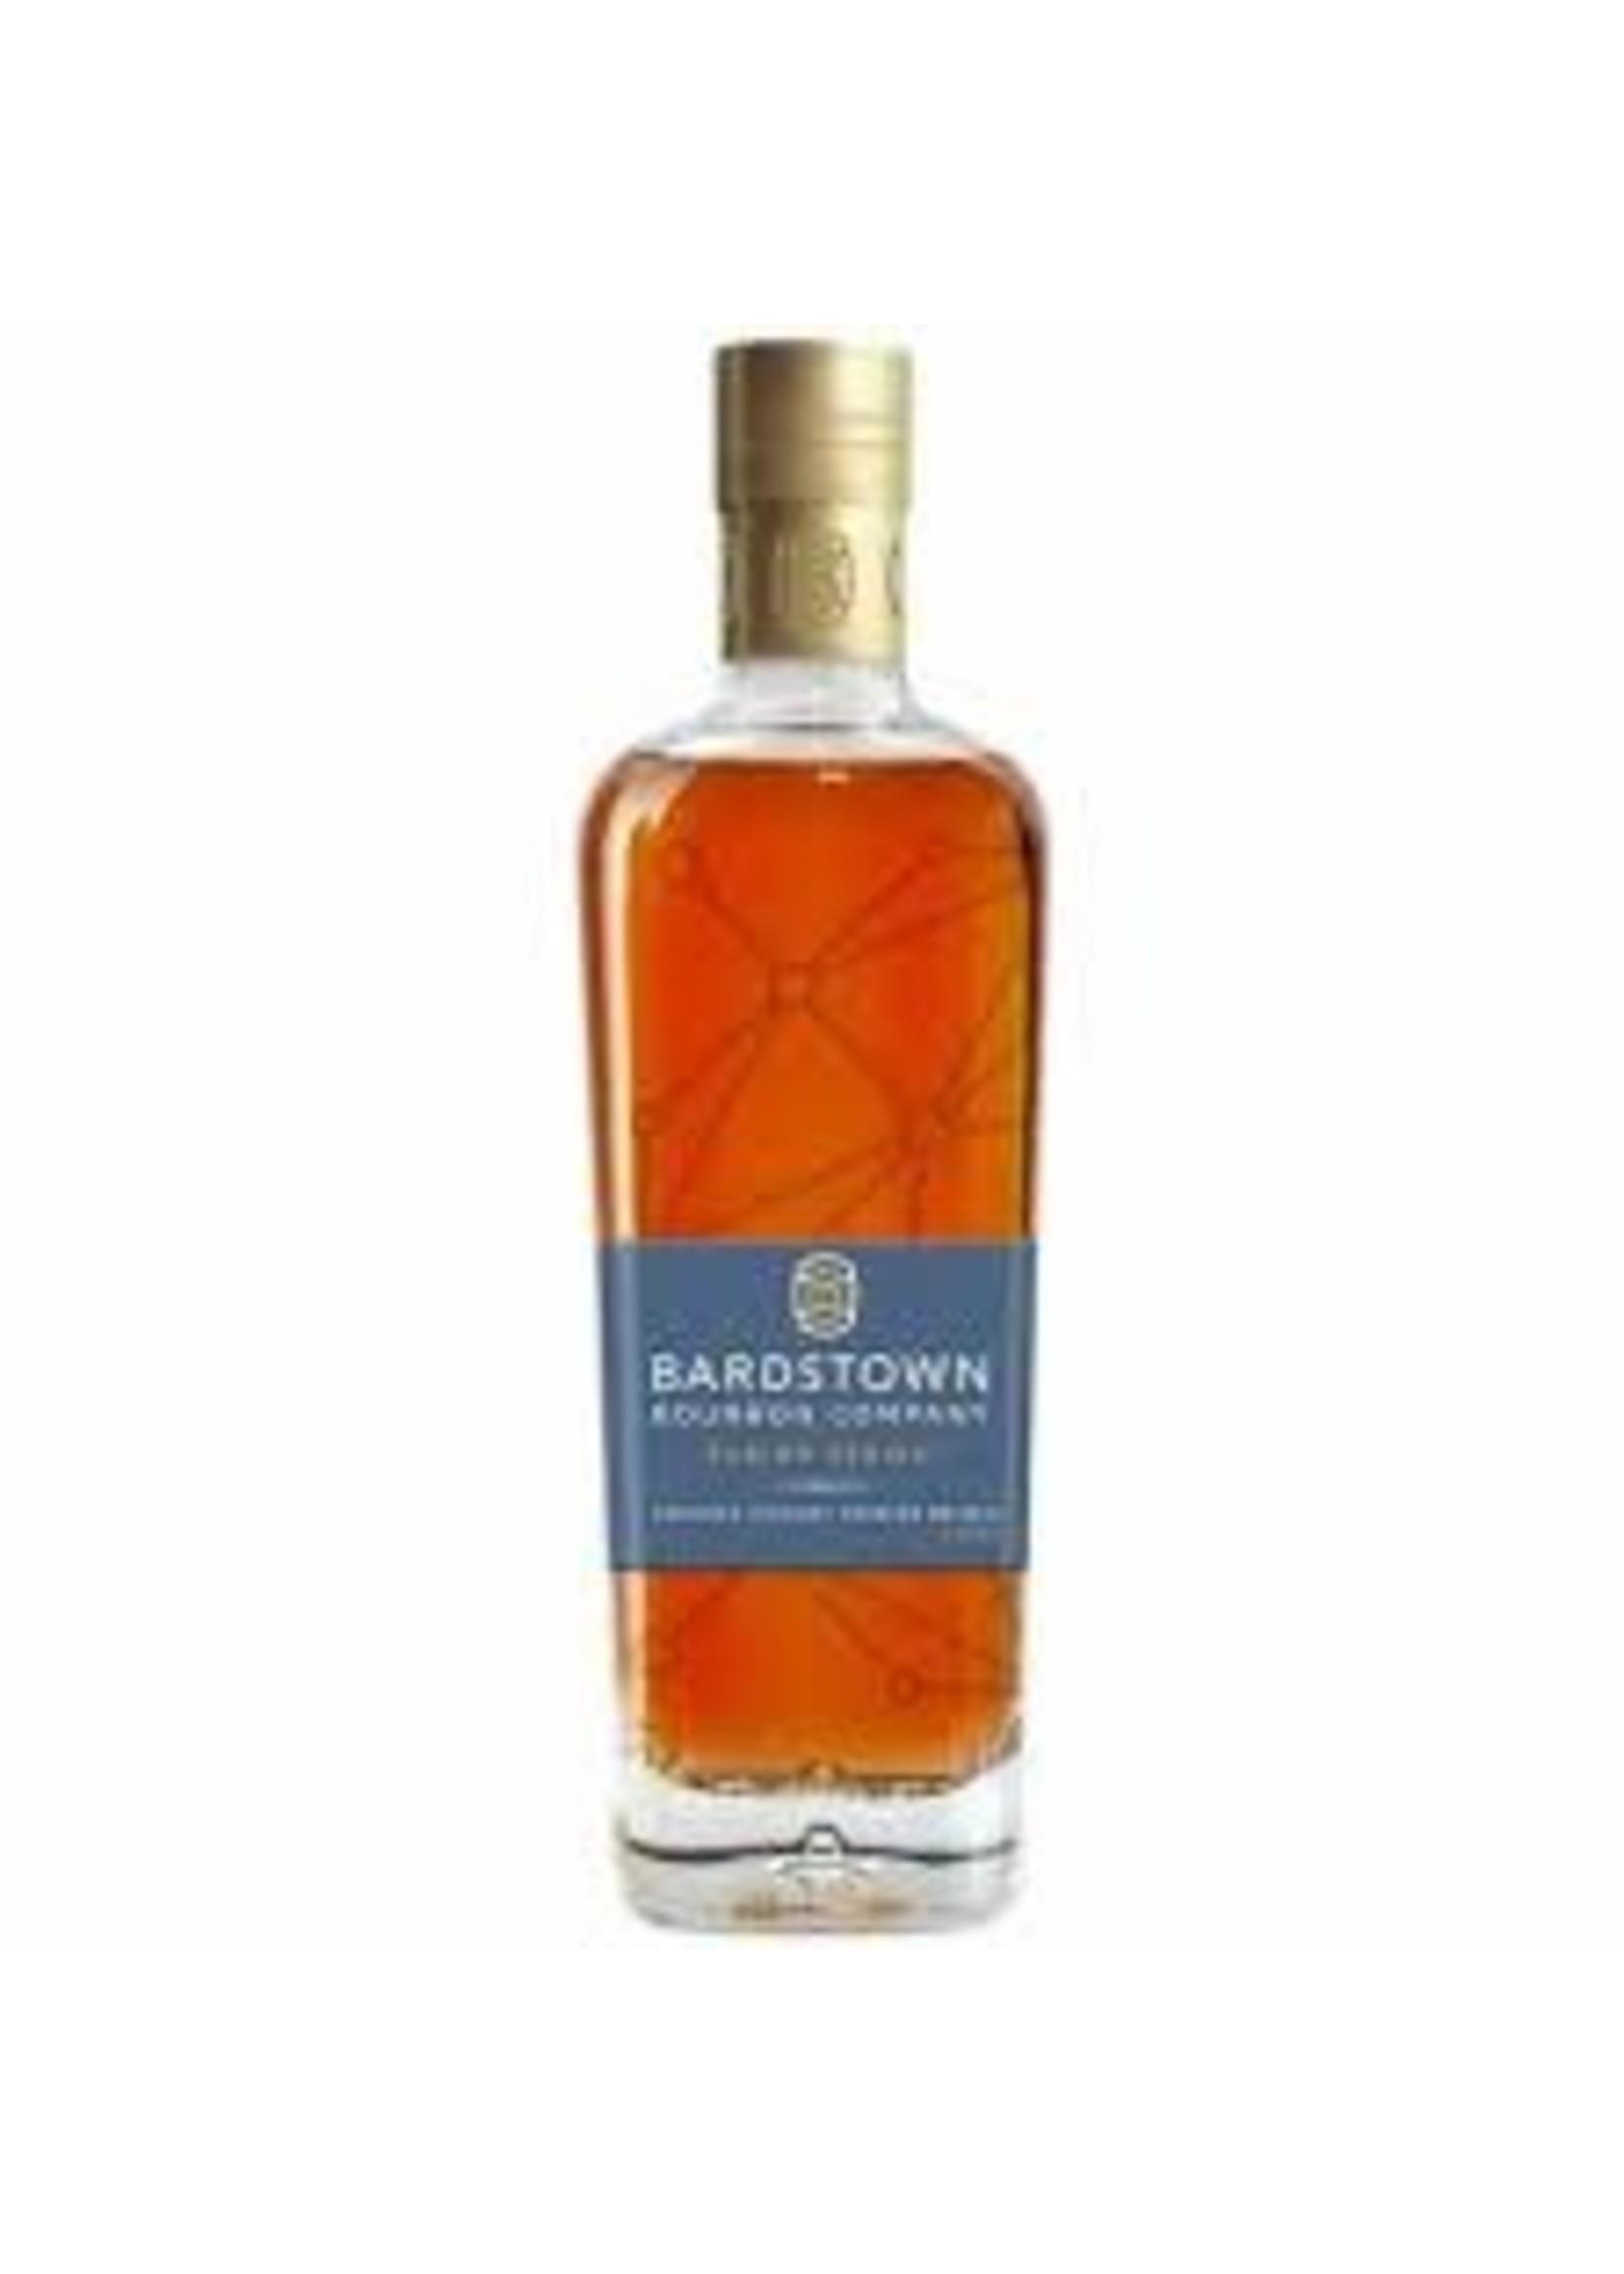 BARDSTOWN BOURBON SERIES 5 CASK STR .750L